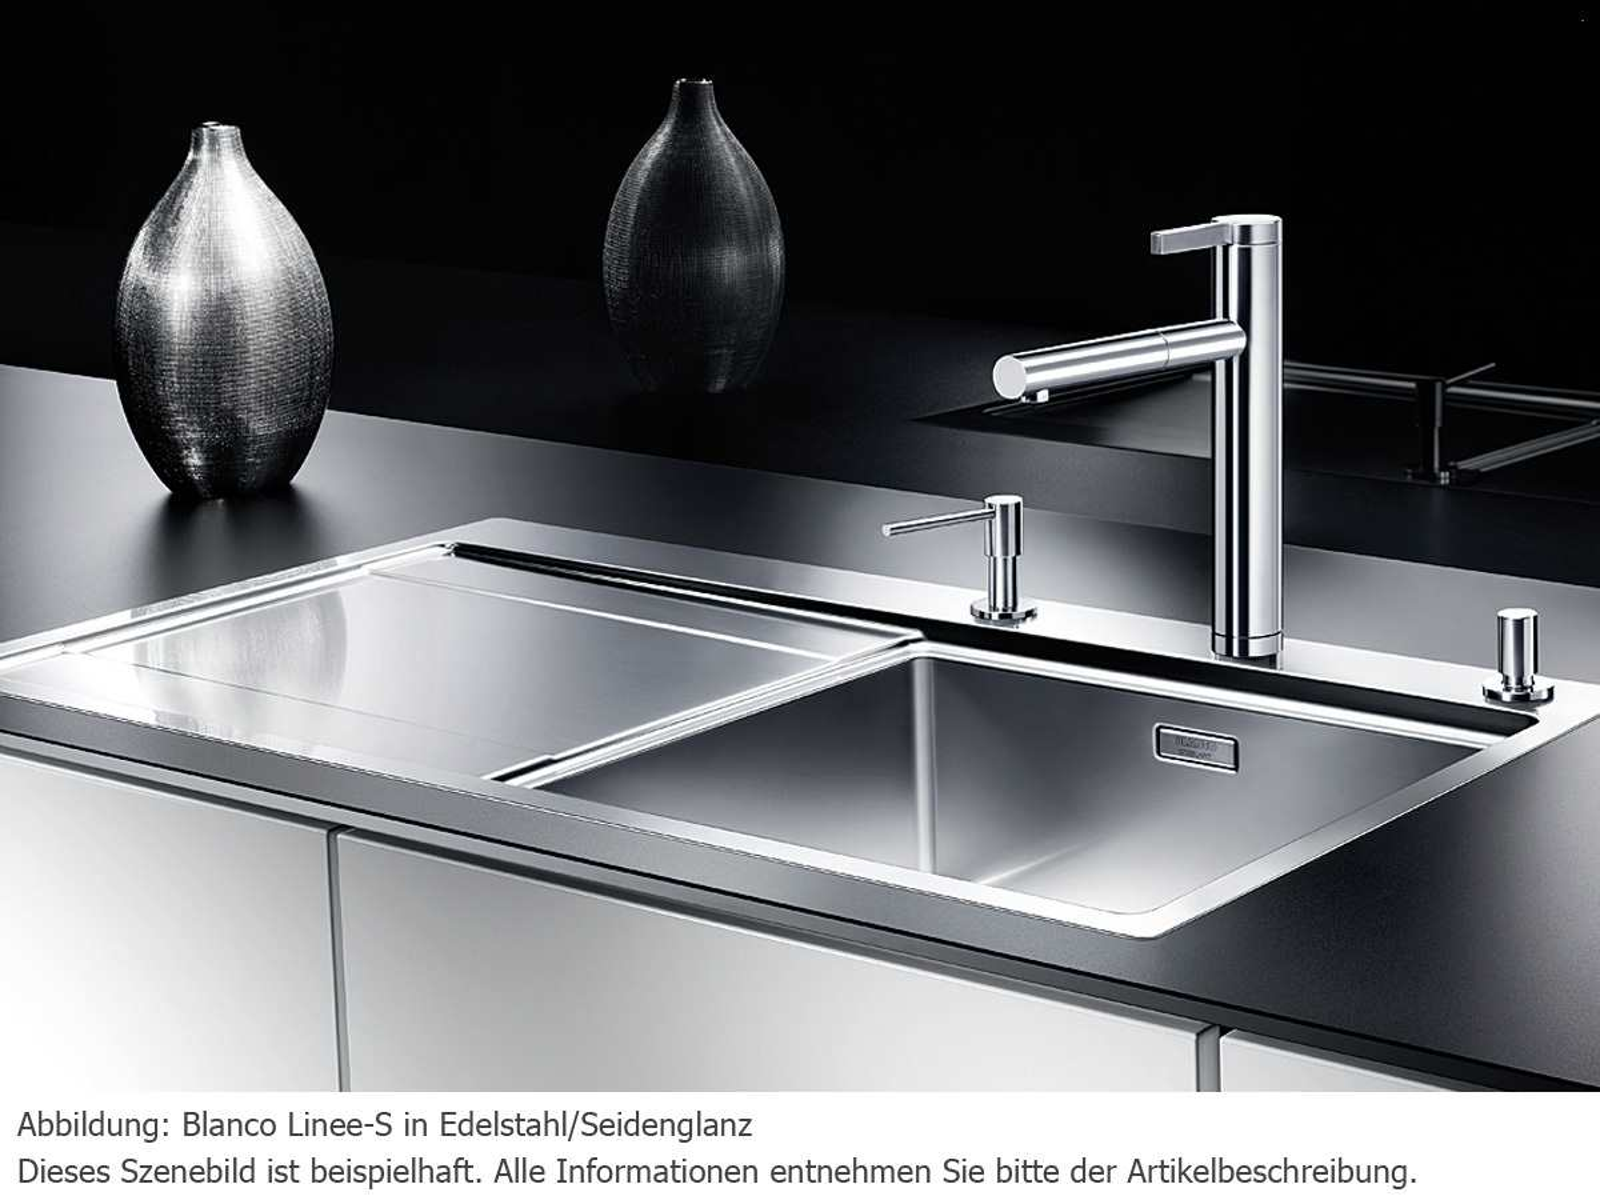 Blanco Linee-S Edelstahl Hochdruckarmatur